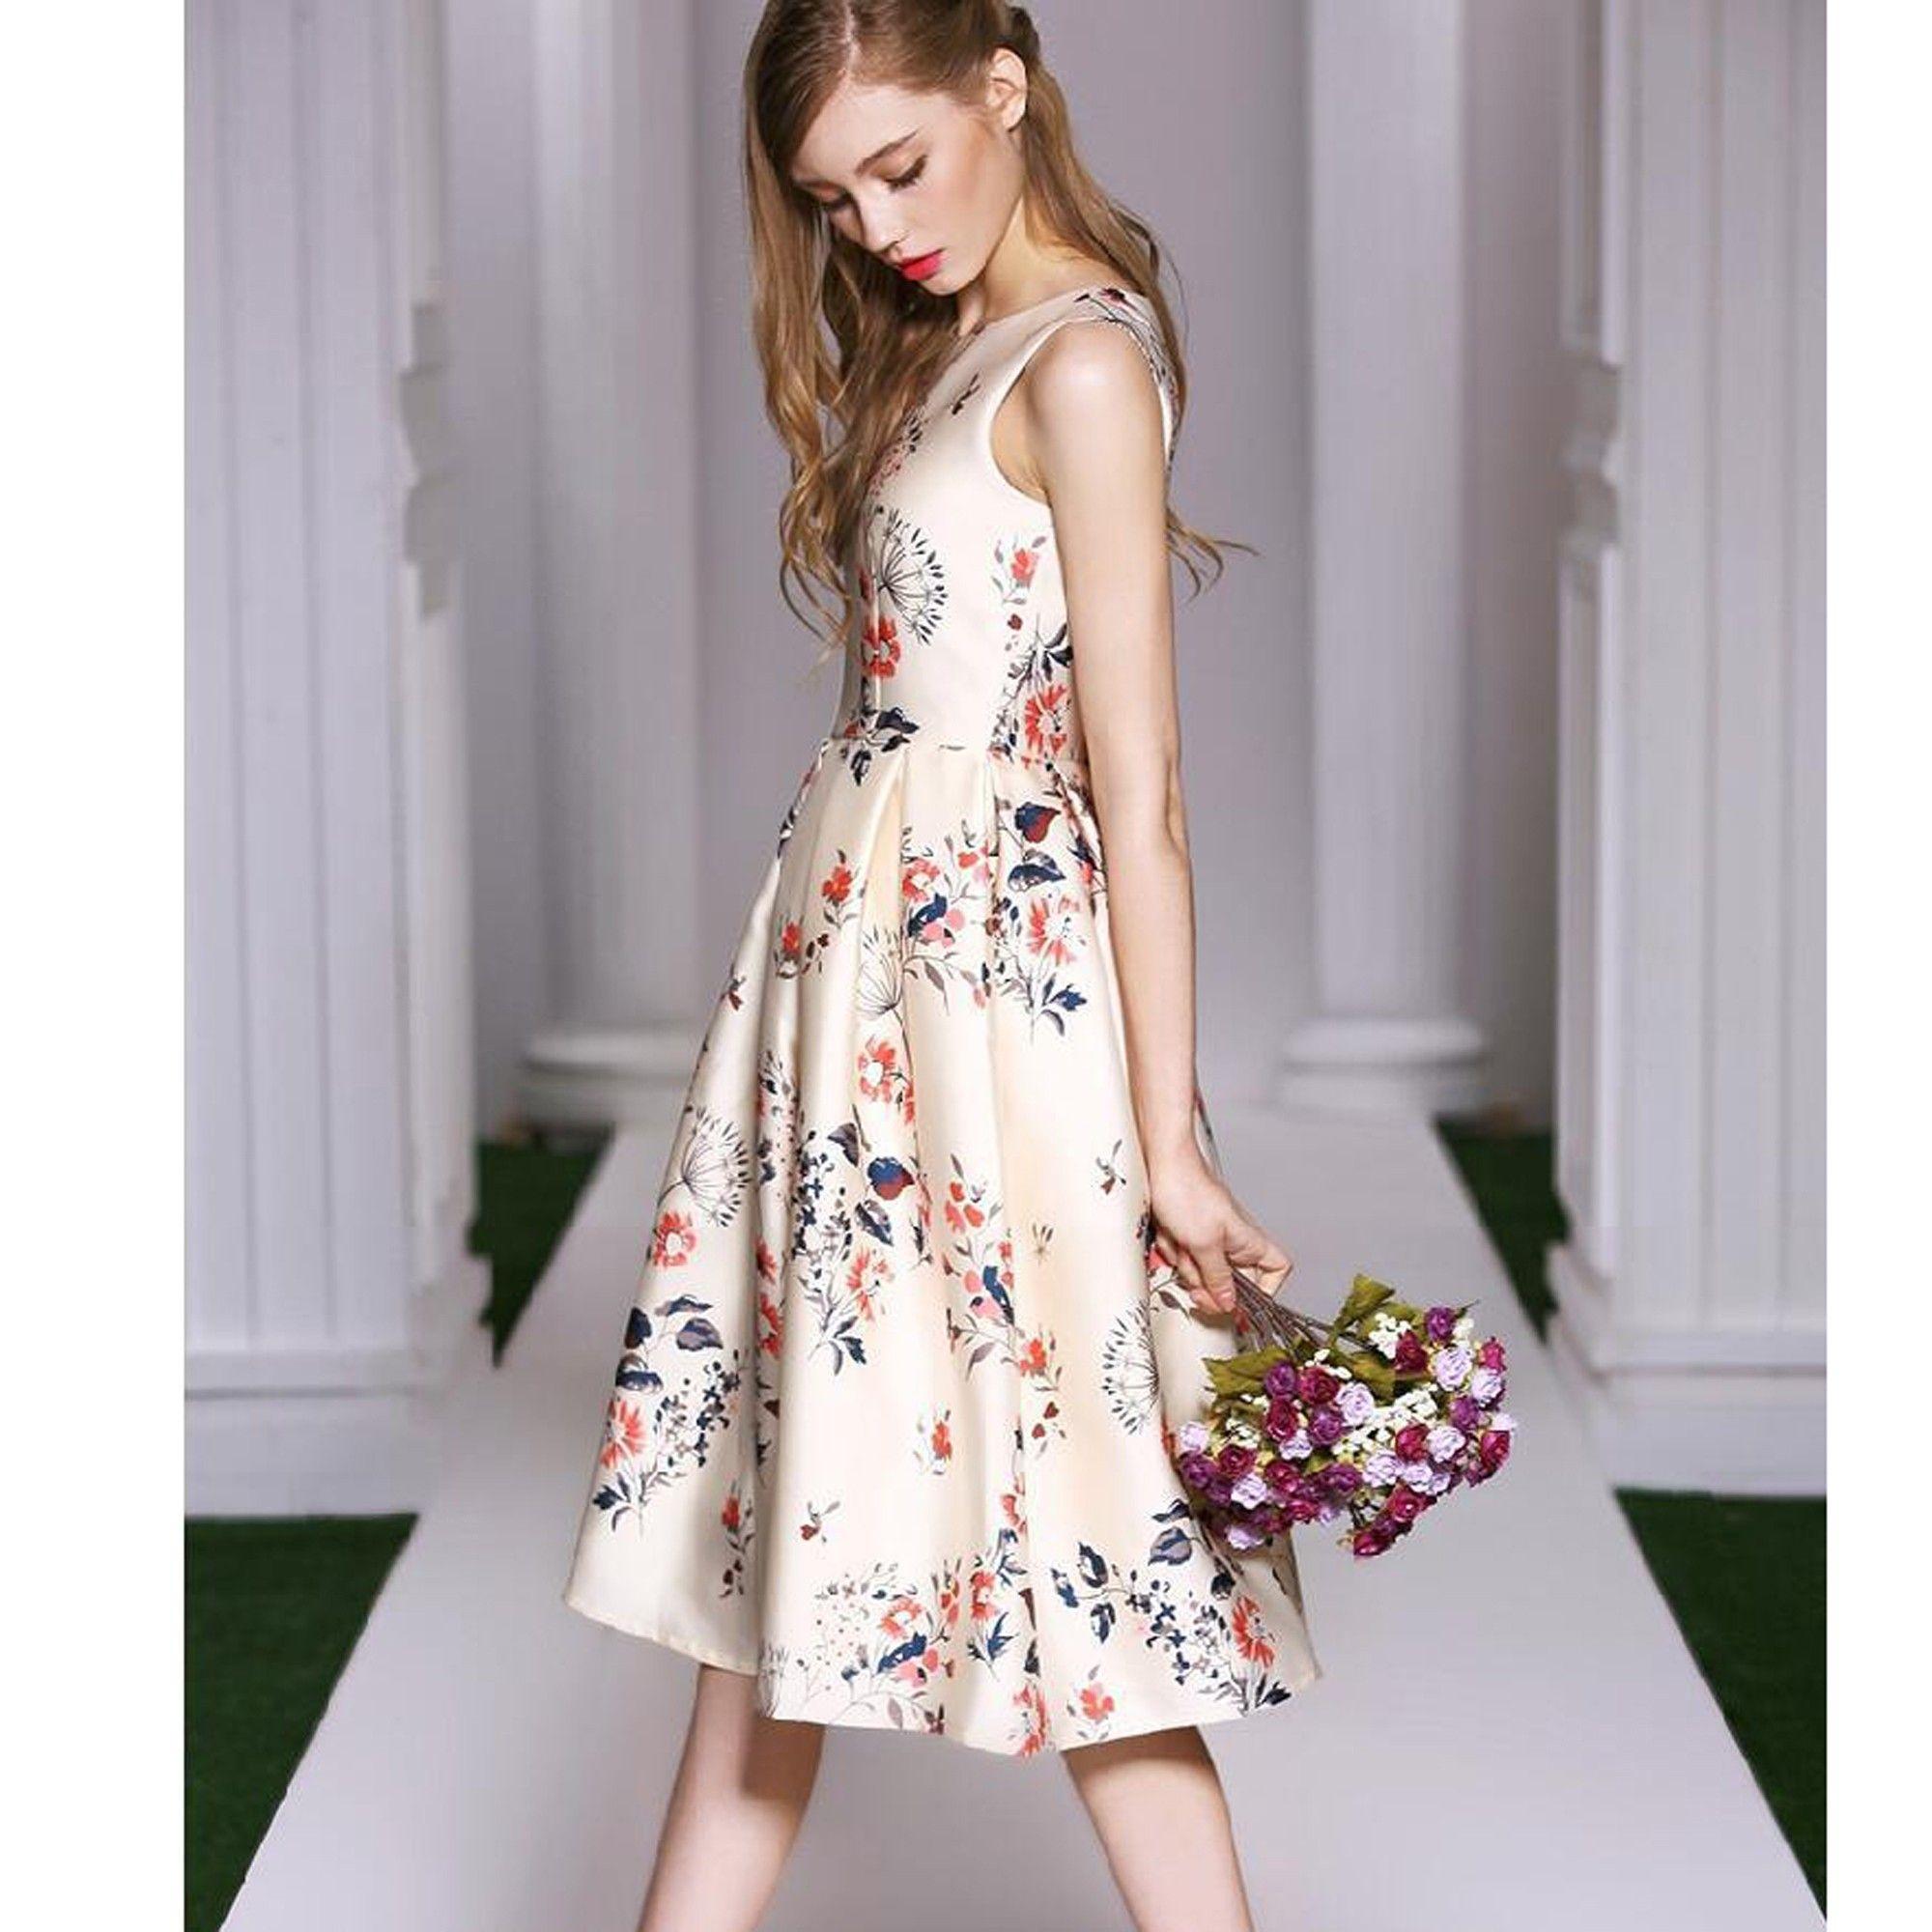 Summer Dress Printed Vintage Pleated Floral Dress - Cream - STUPA FASHION